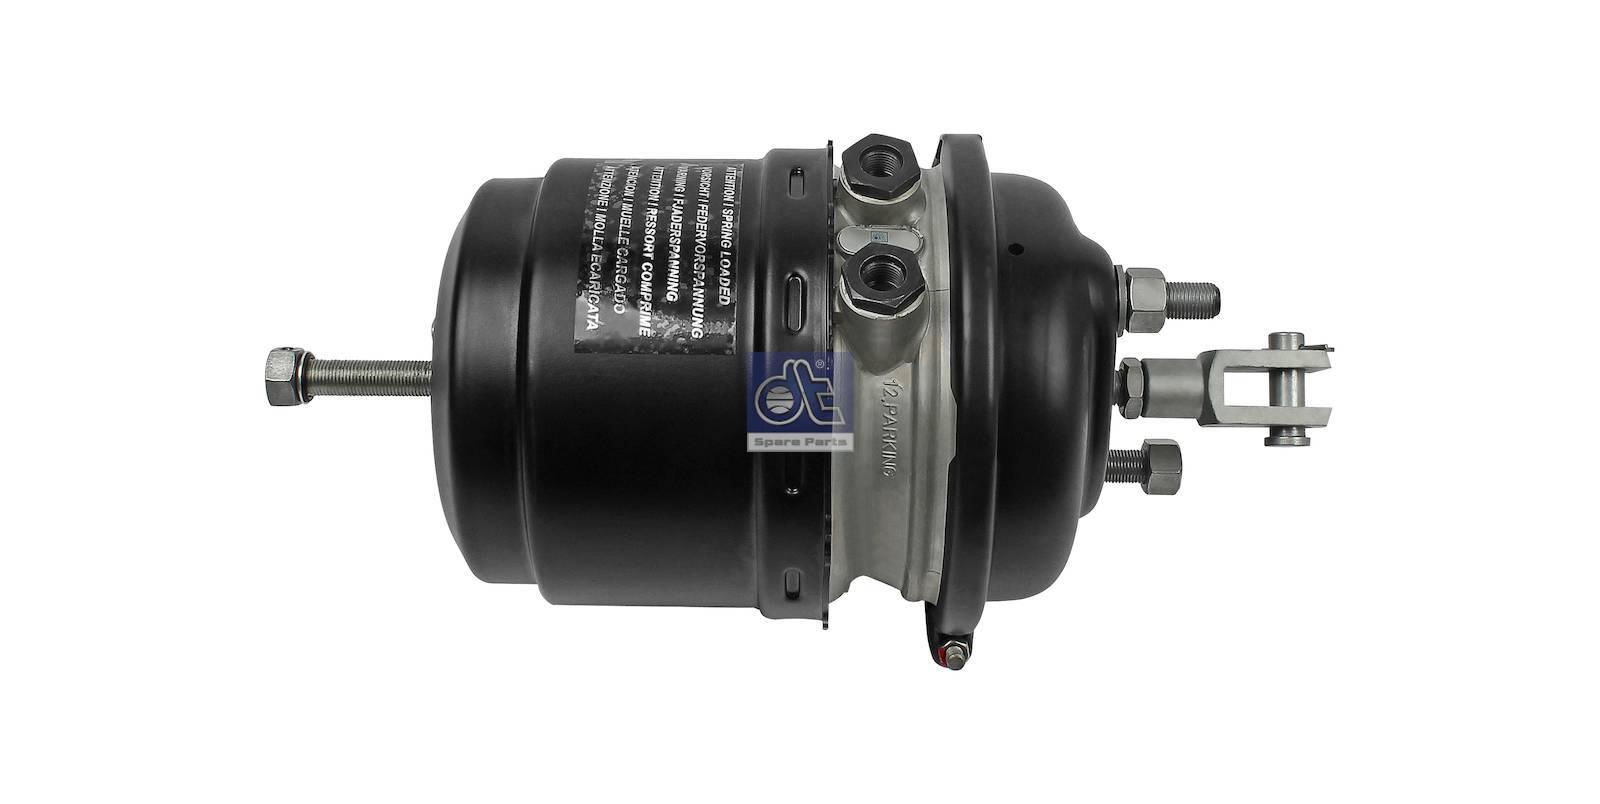 Cilindro de freio de mola acumuladora